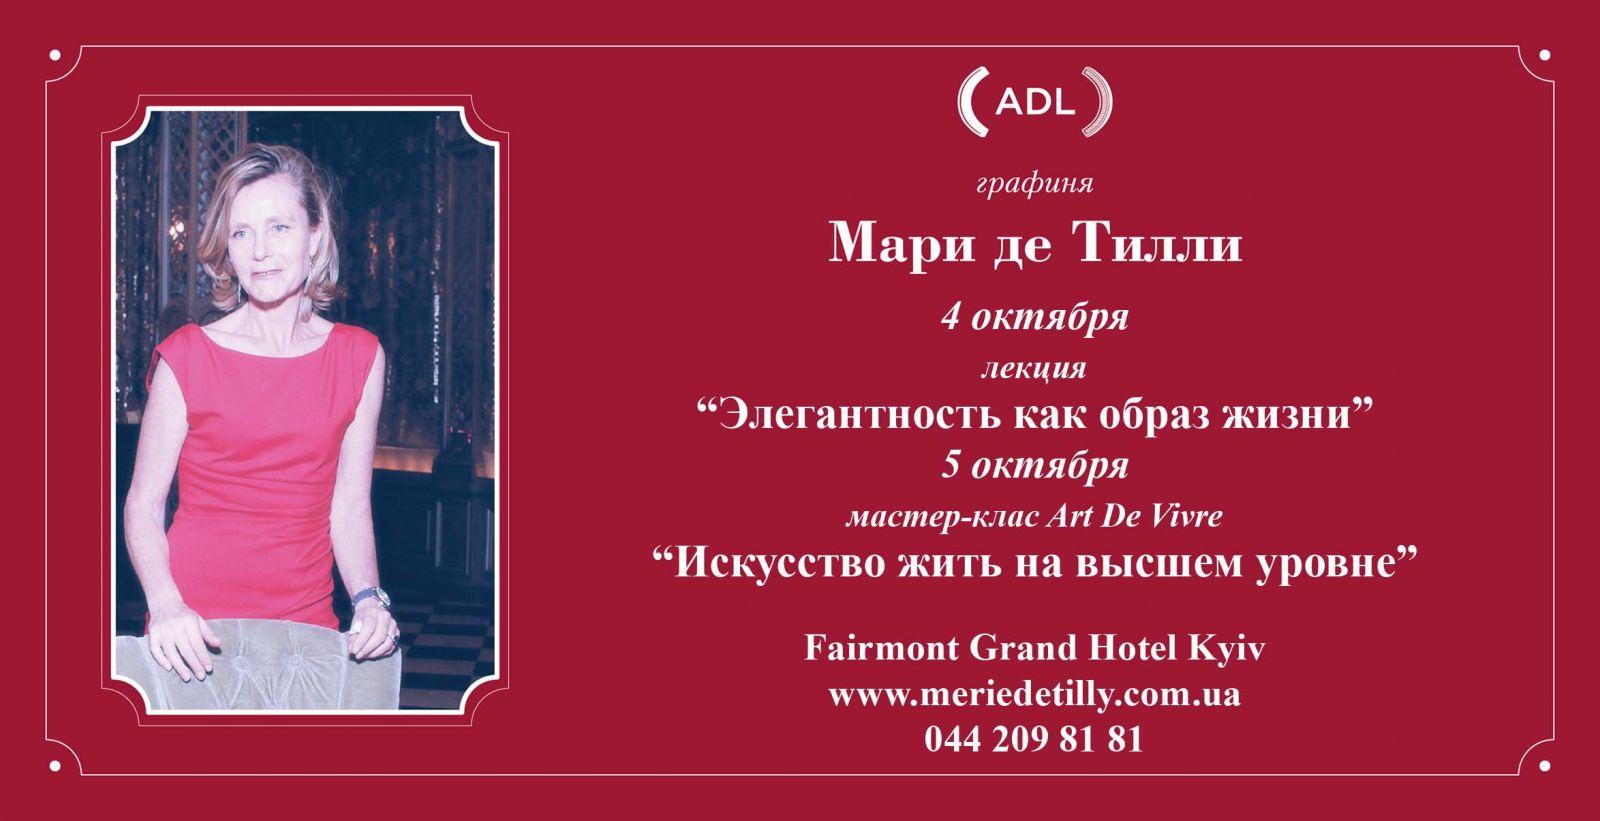 Графиня Мари де Тилли посетит Киев с мастер-классами - фото №2